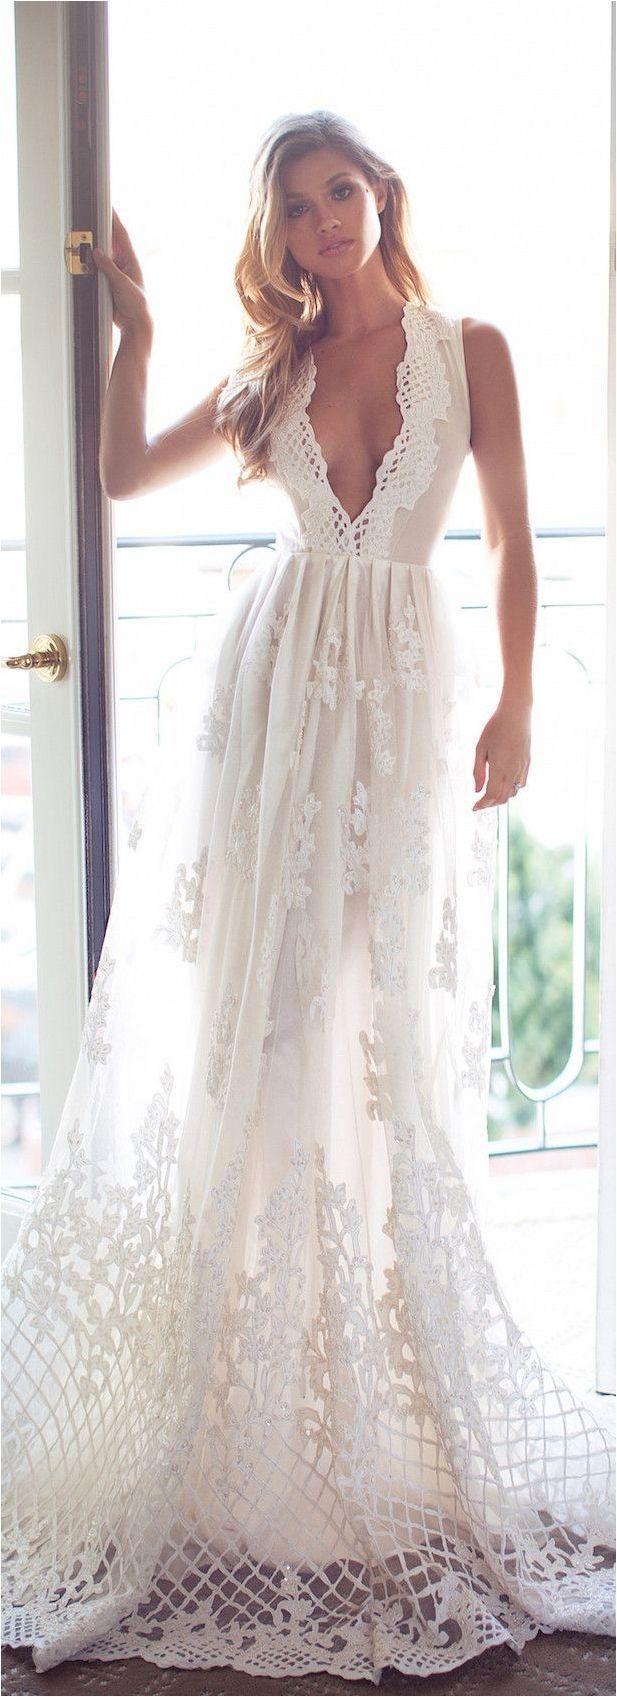 Beach wedding dresses guest   Wedding Dresses Beach Wedding  Womenus Dresses for Wedding